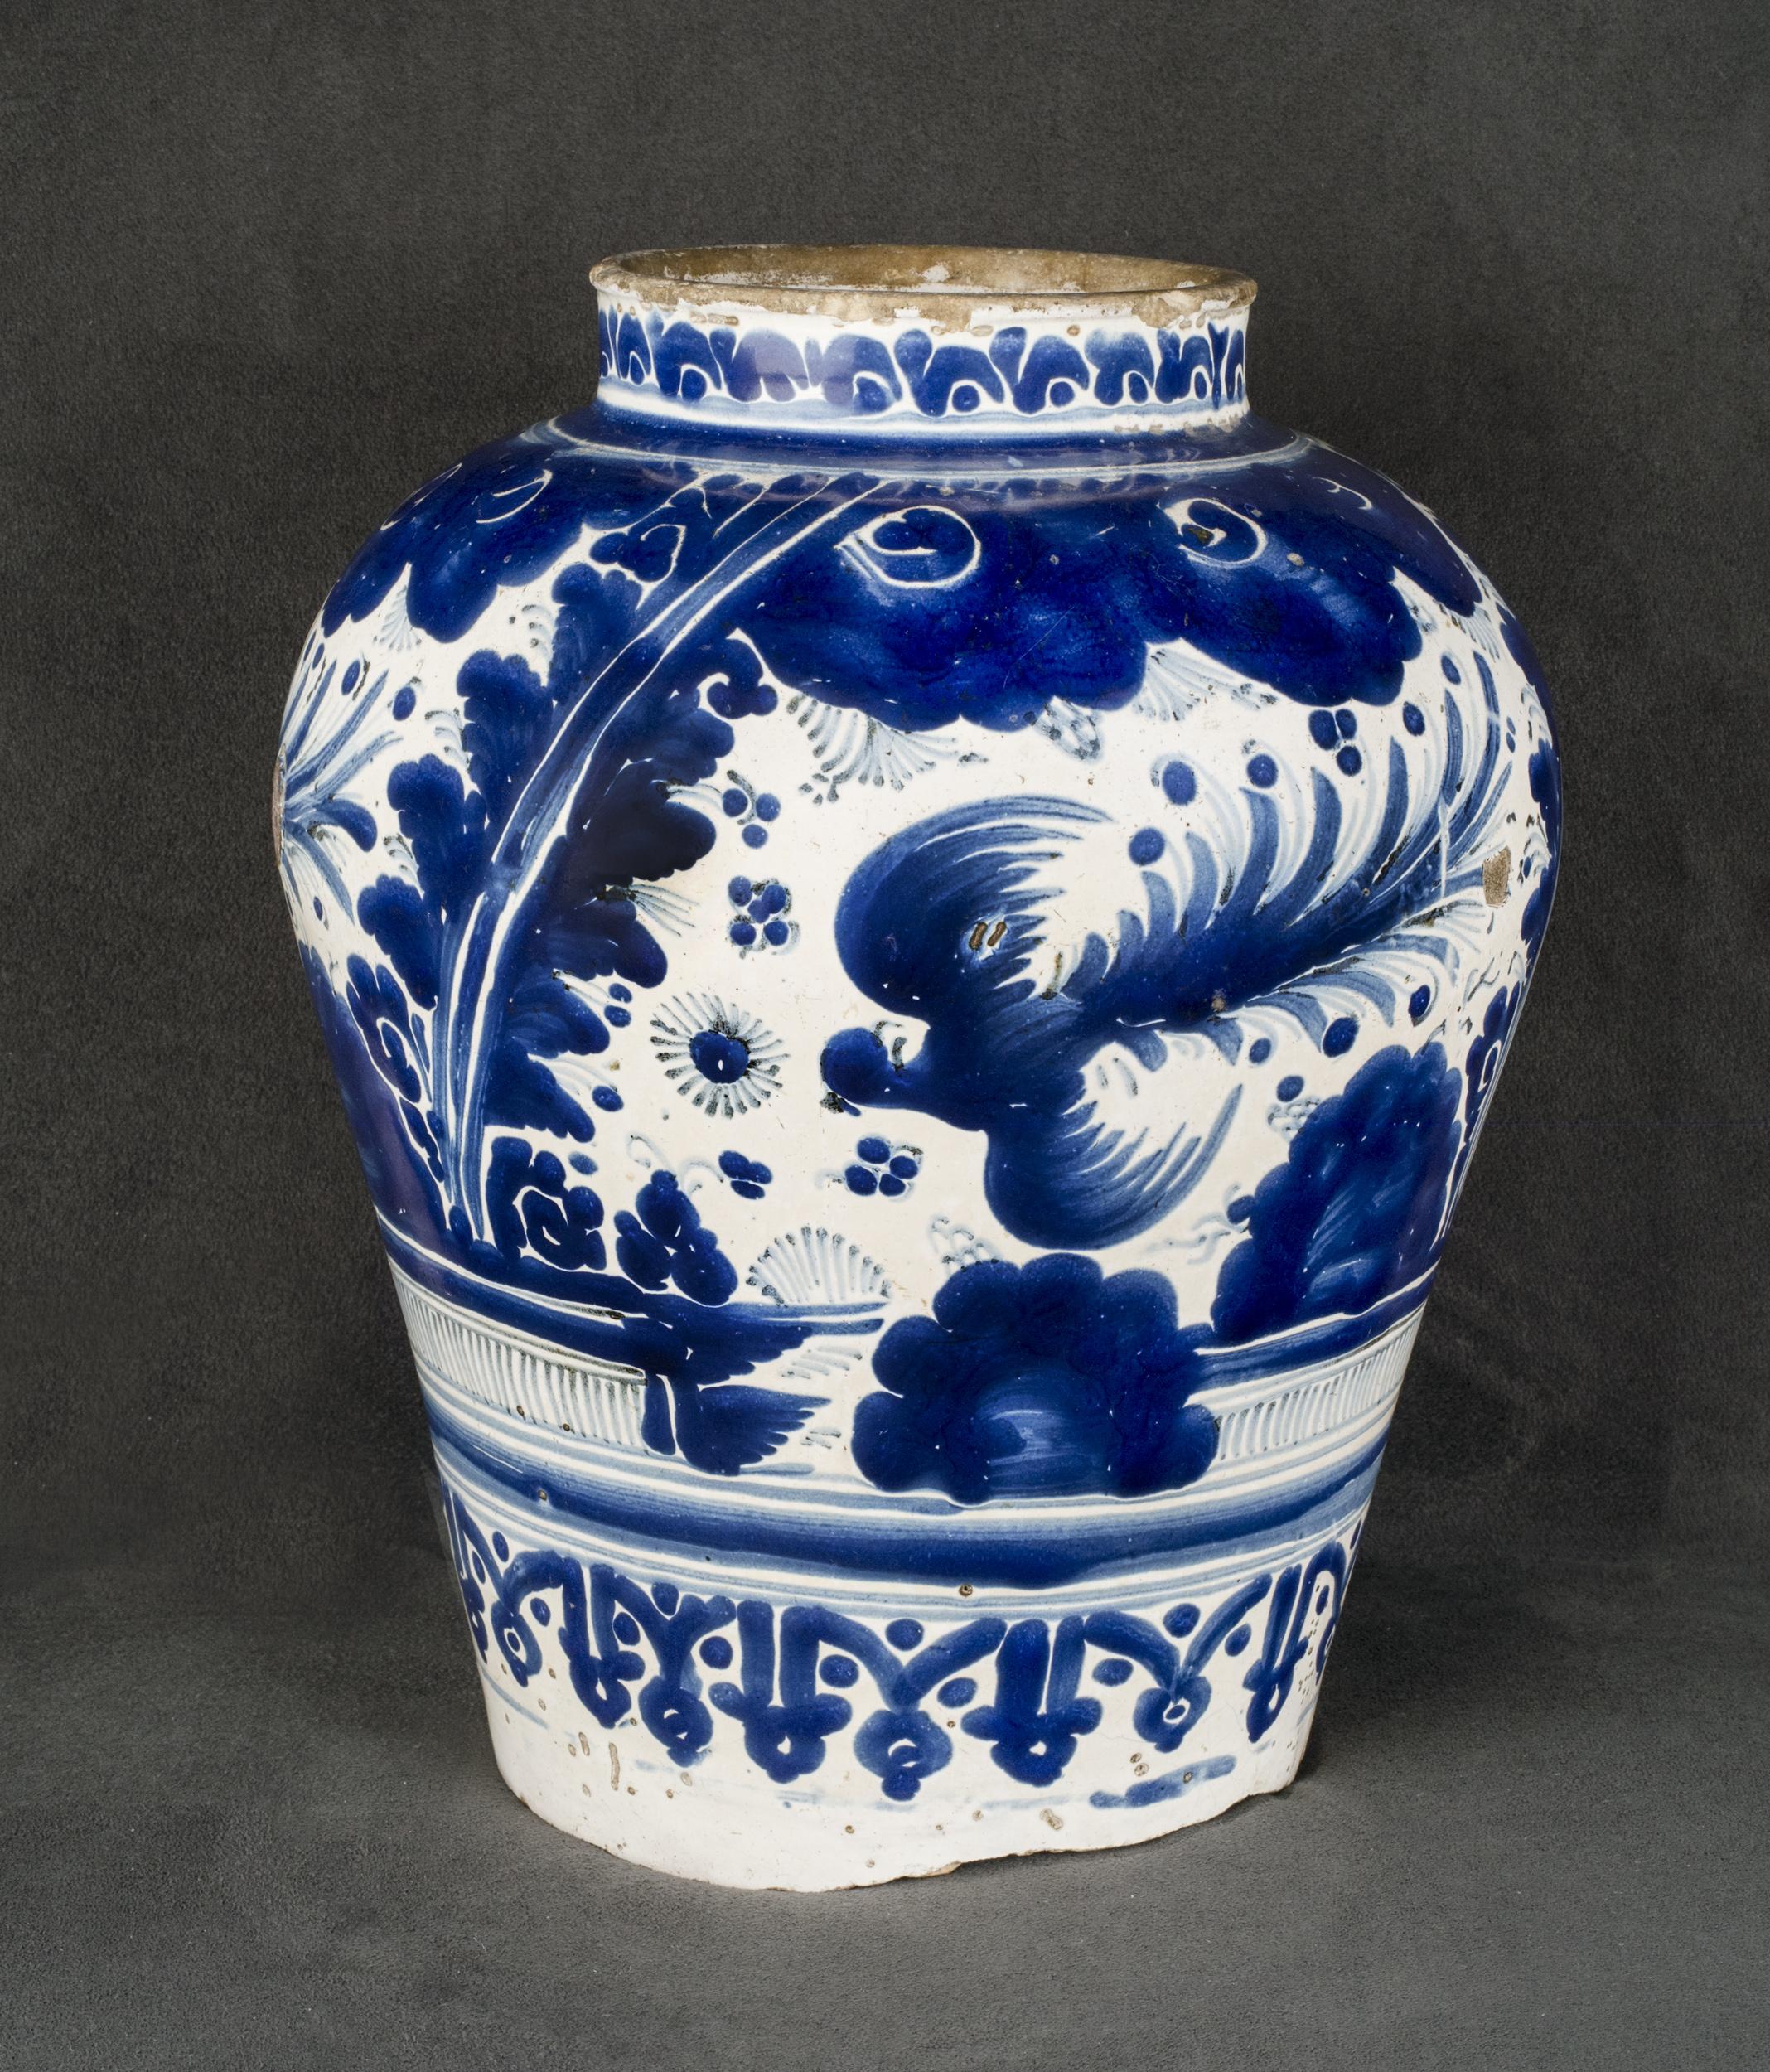 Mexican Talavera Poblana Ceramic, Jar in rich cobalt blue with quetzal decoration